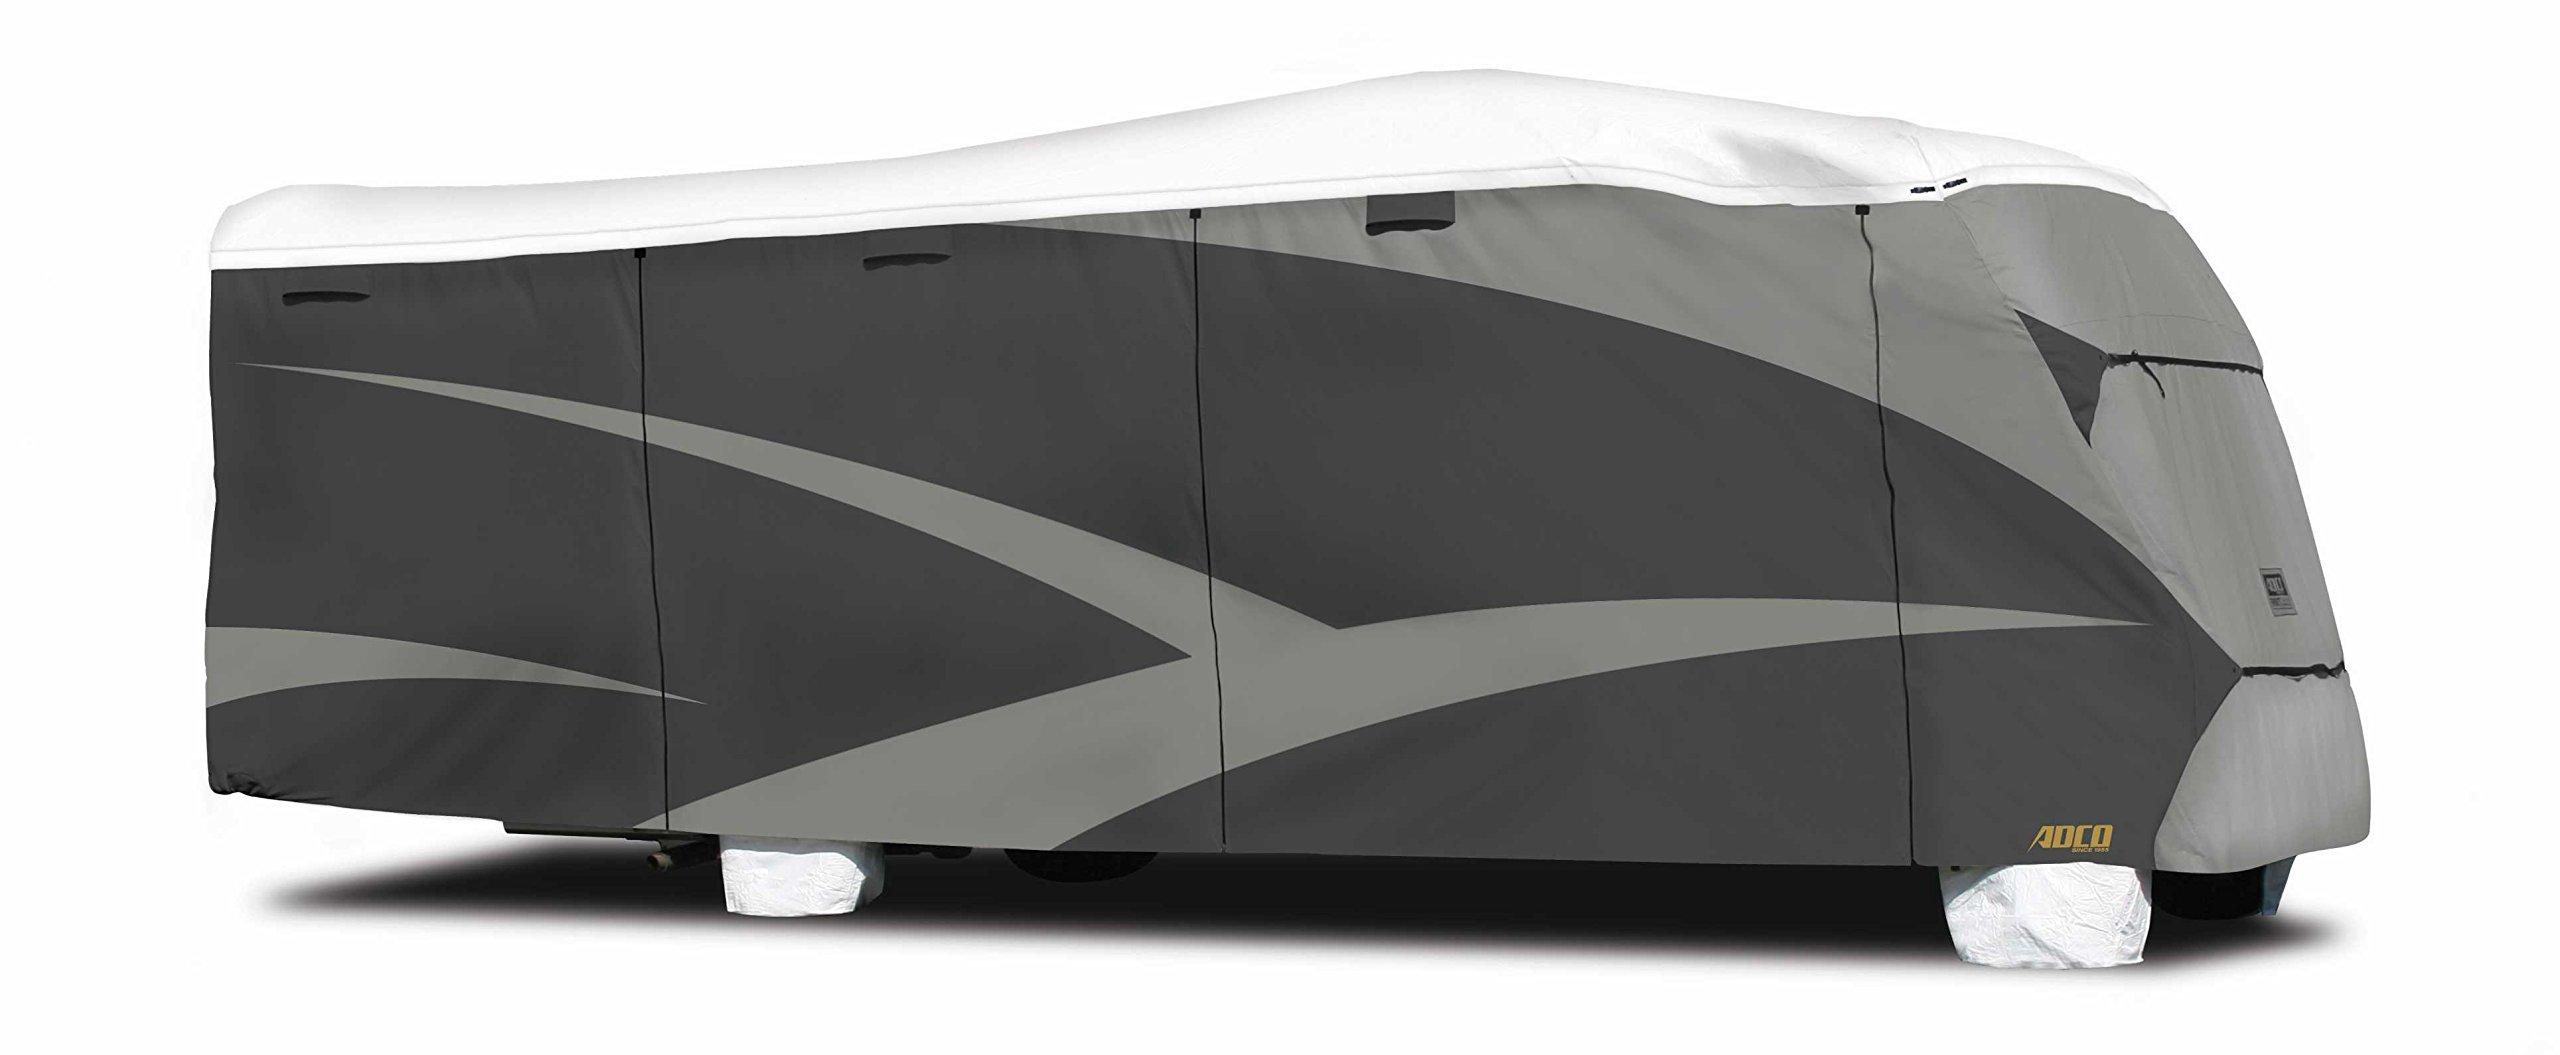 ADCO 34812 Designer Series Gray/White 20' 1'' - 23' DuPont Tyvek Class C Motorhome Cover